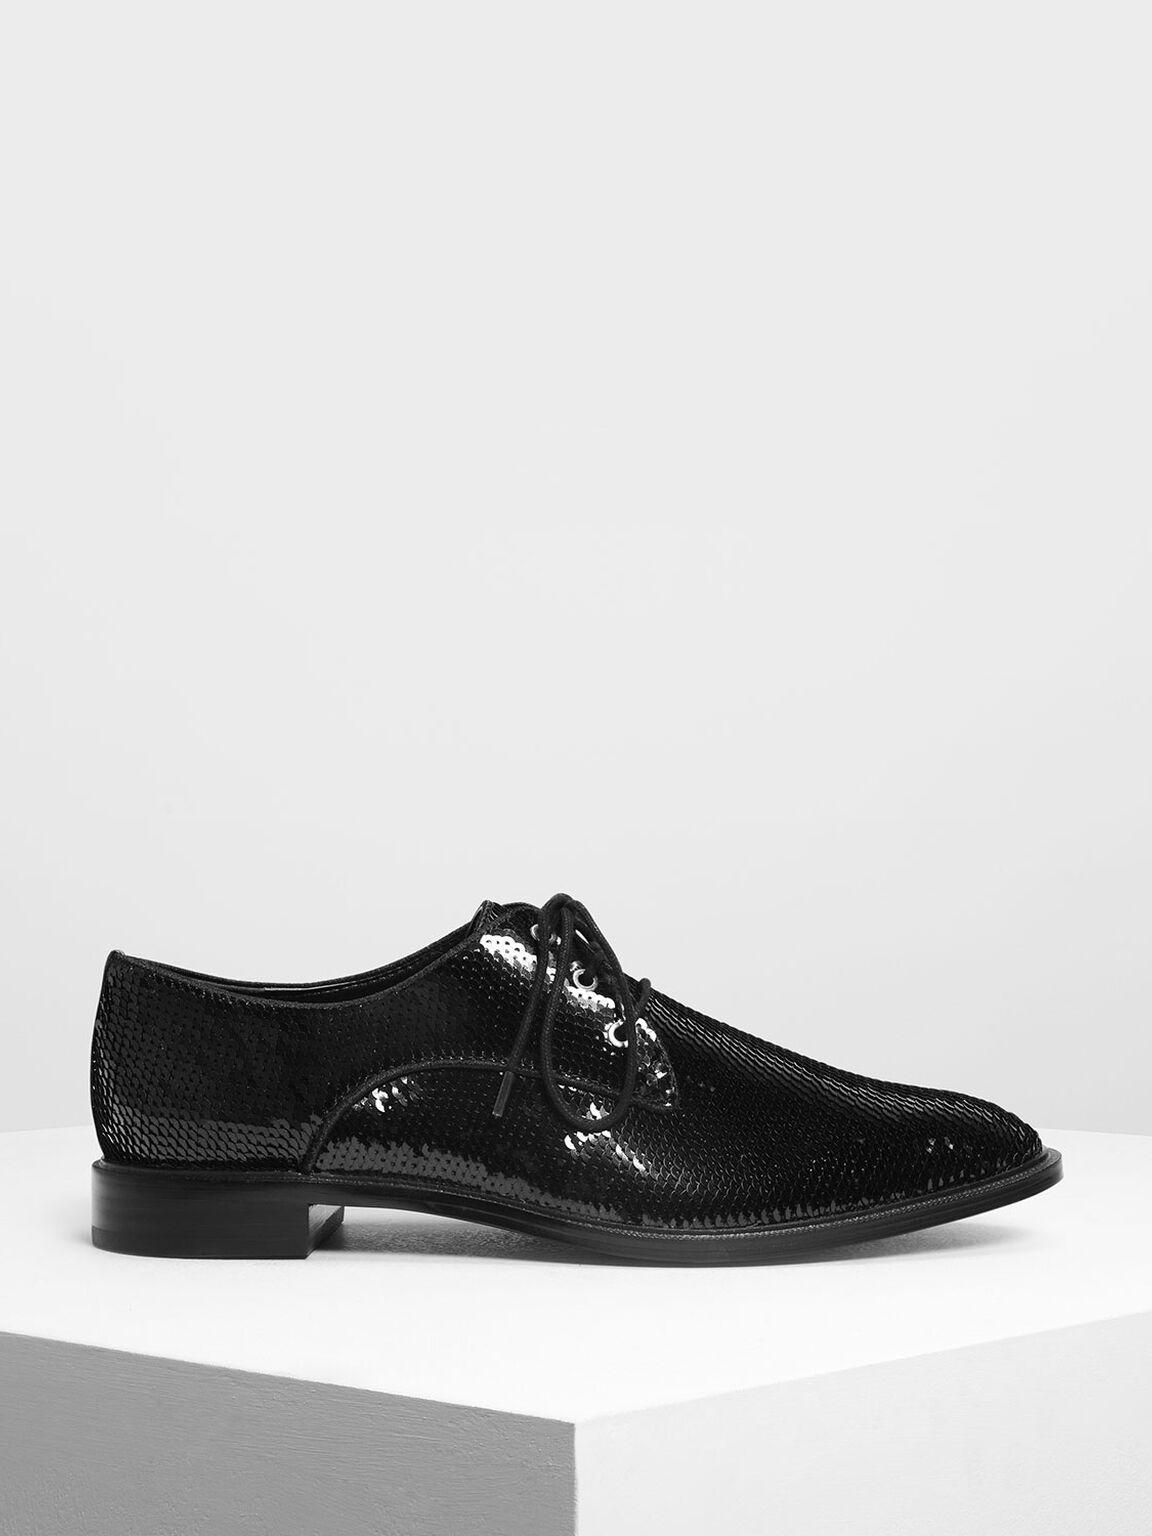 Sequin Derby Shoes, Black, hi-res